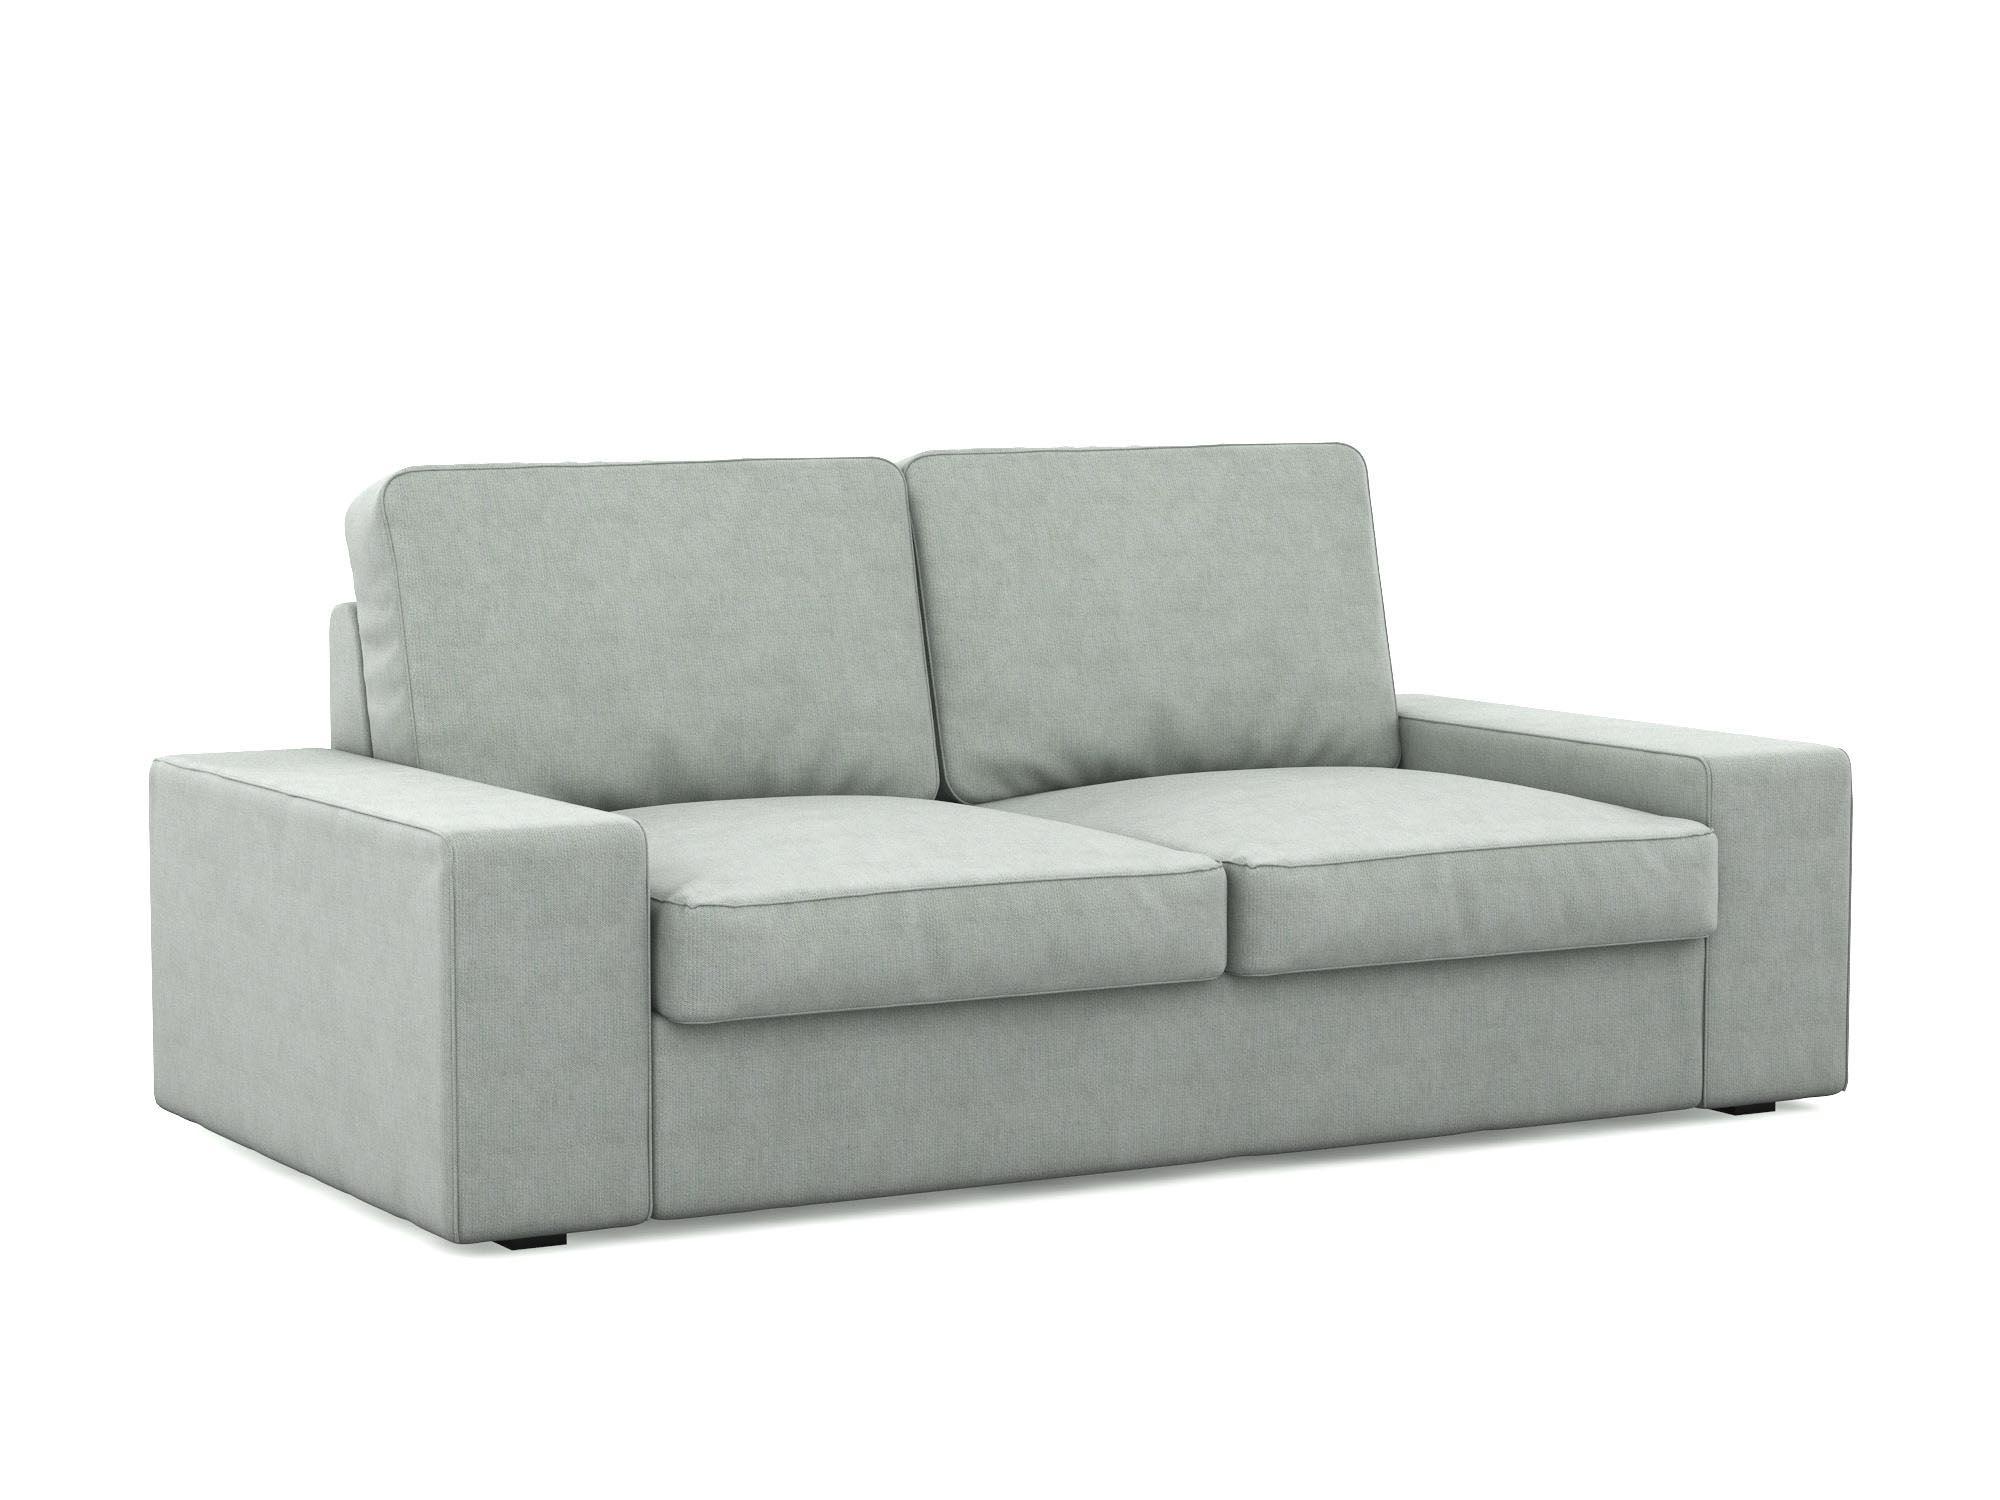 Peachy Your New Ikea Kivik 2 Seater Sofa Cover Vidian Design Com Pabps2019 Chair Design Images Pabps2019Com